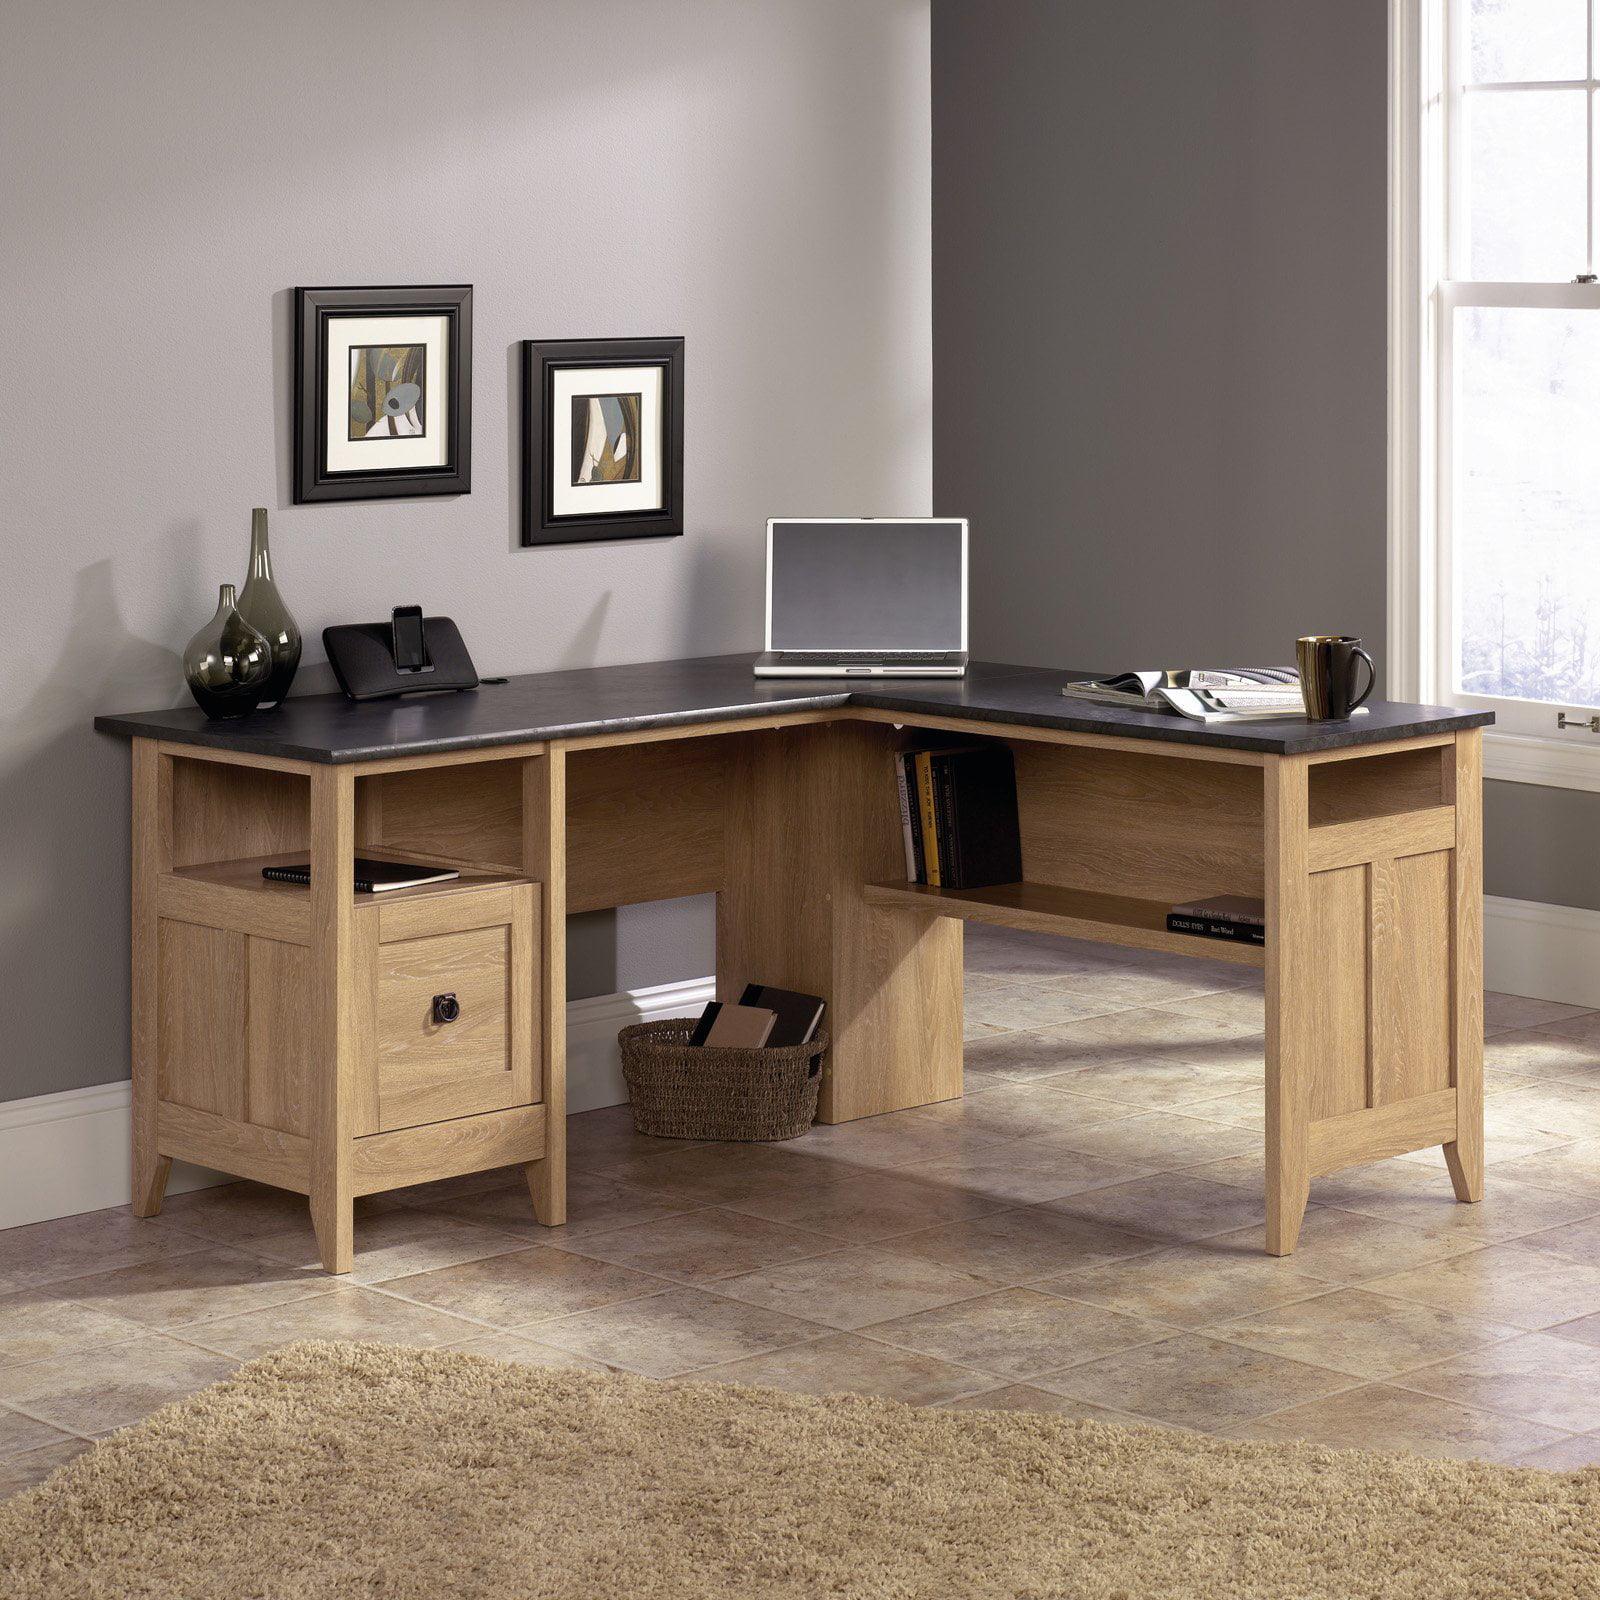 Sauder August Hill L-Desk, Dover Oak by Sauder Woodworking